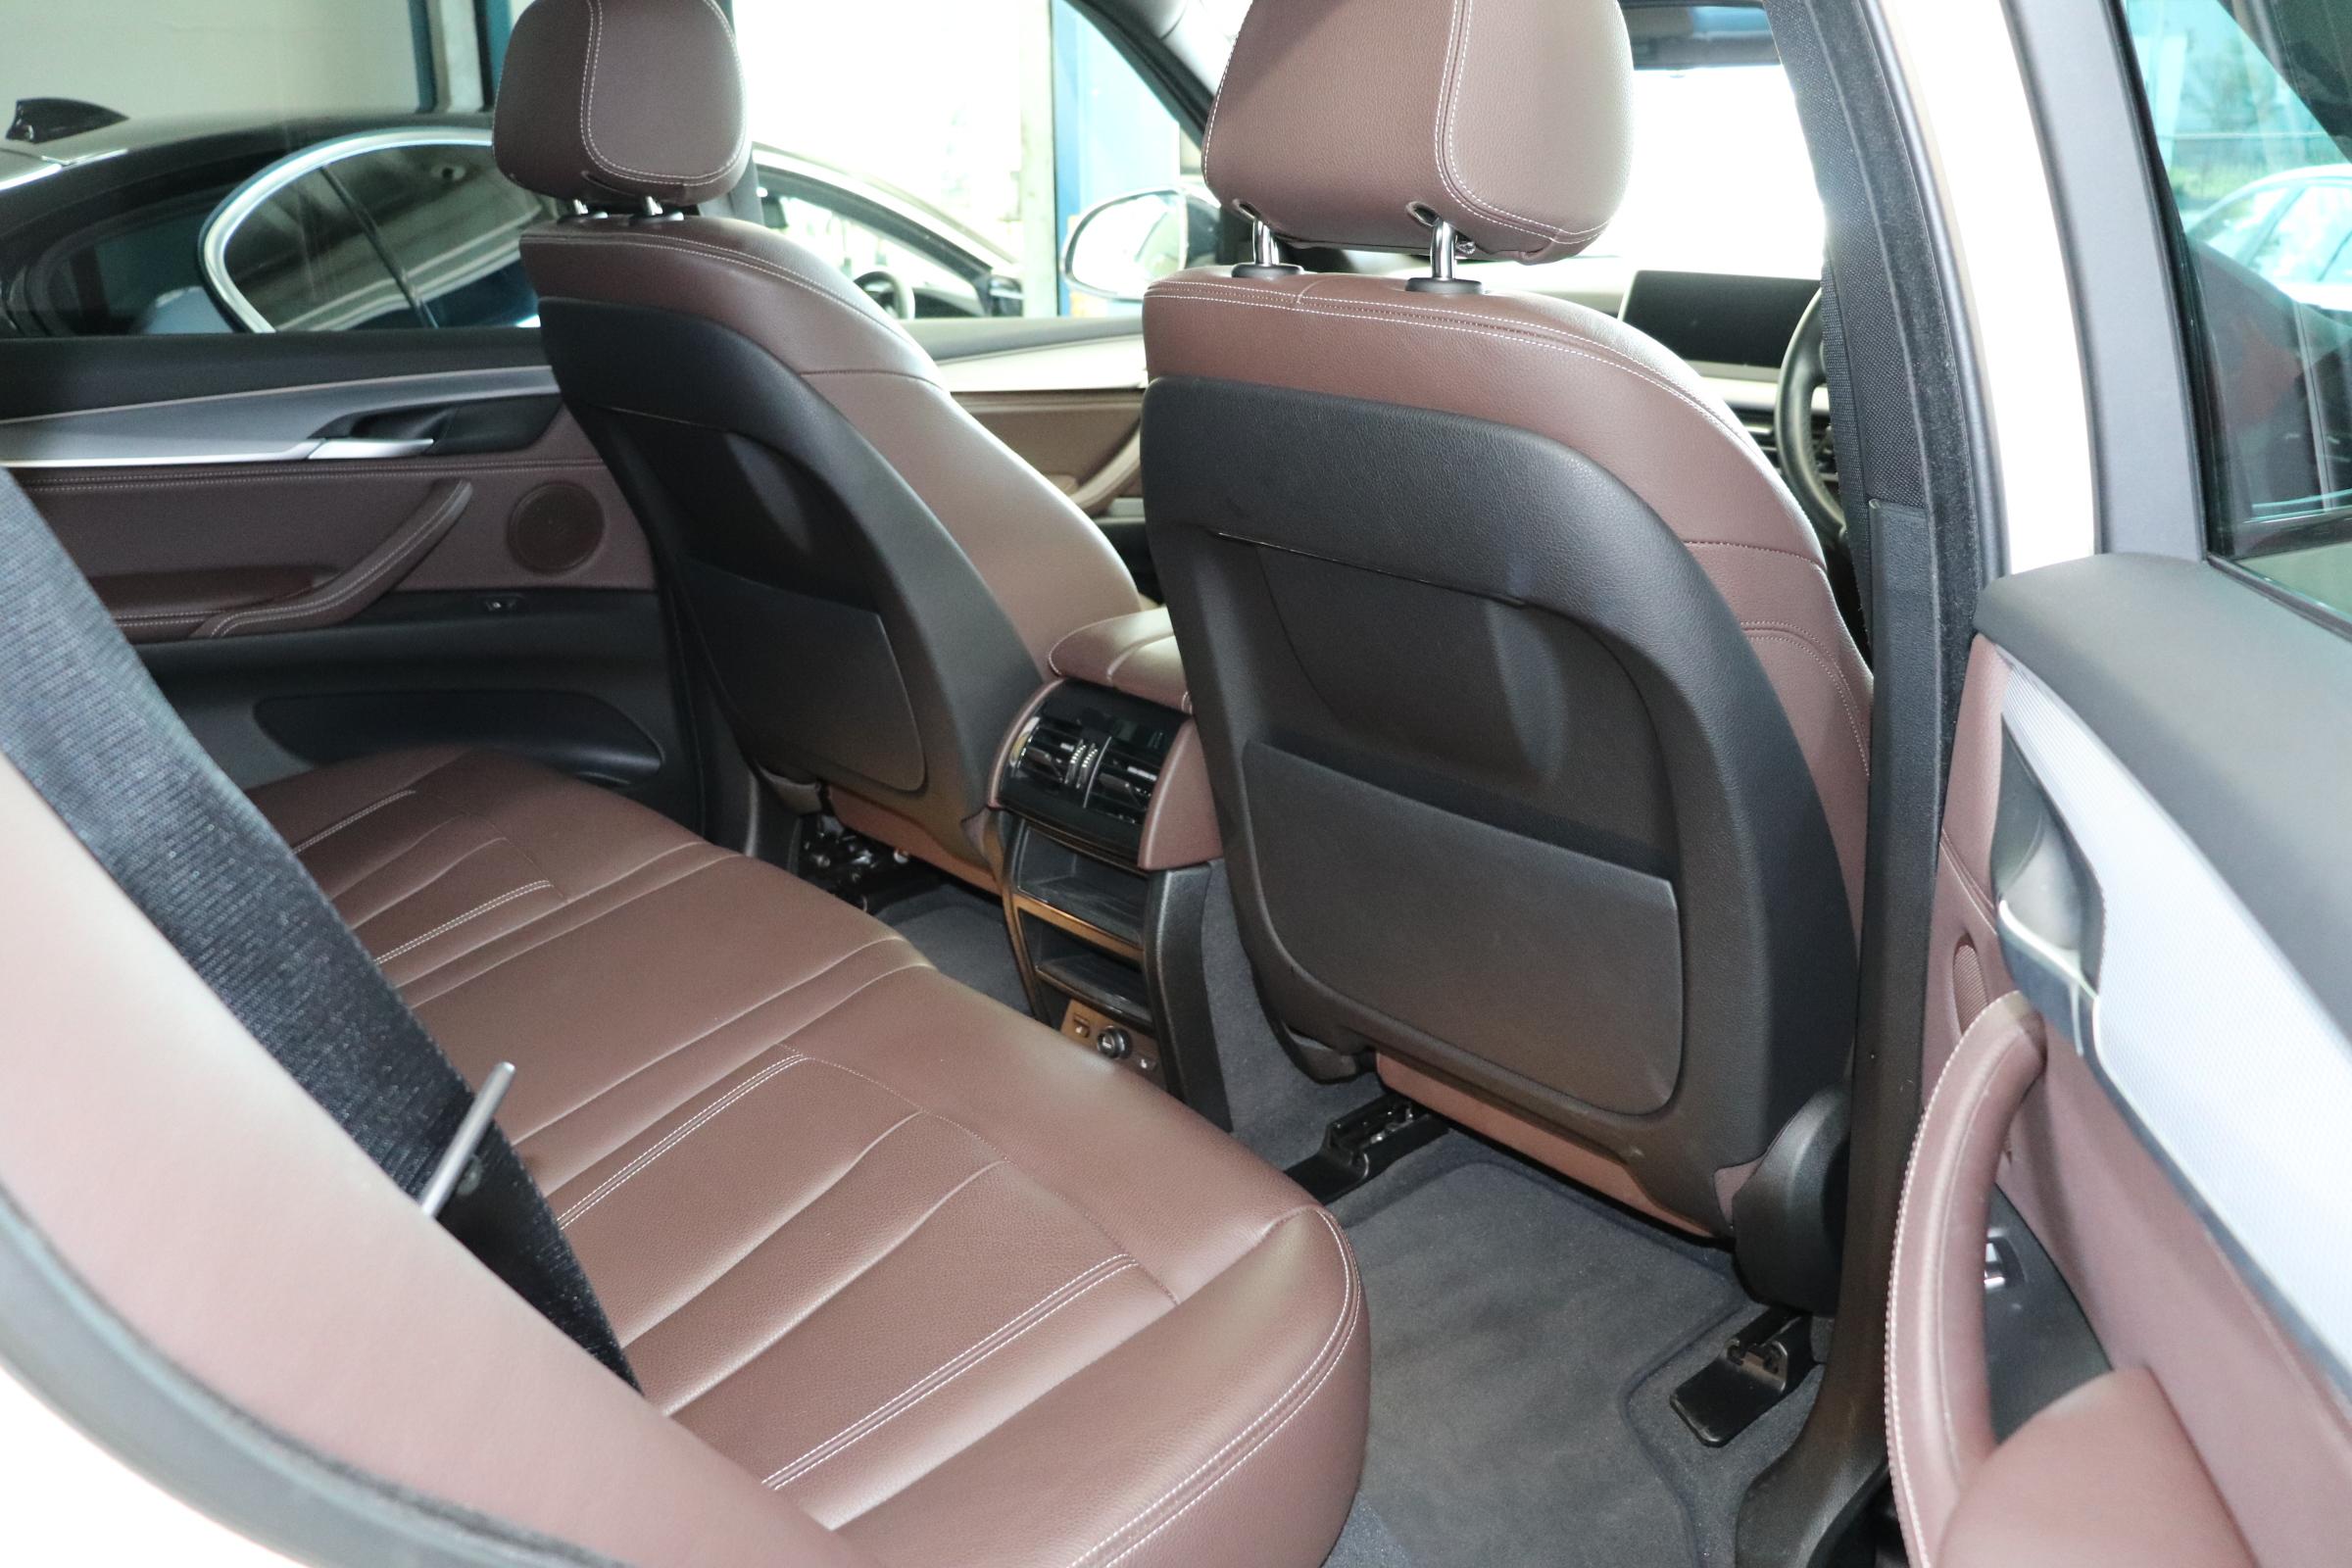 X5 xドライブ 35d Mスポーツ セレクトPKG LEDライト Pサンルーフ Sクローズ ACC 茶革車両画像12